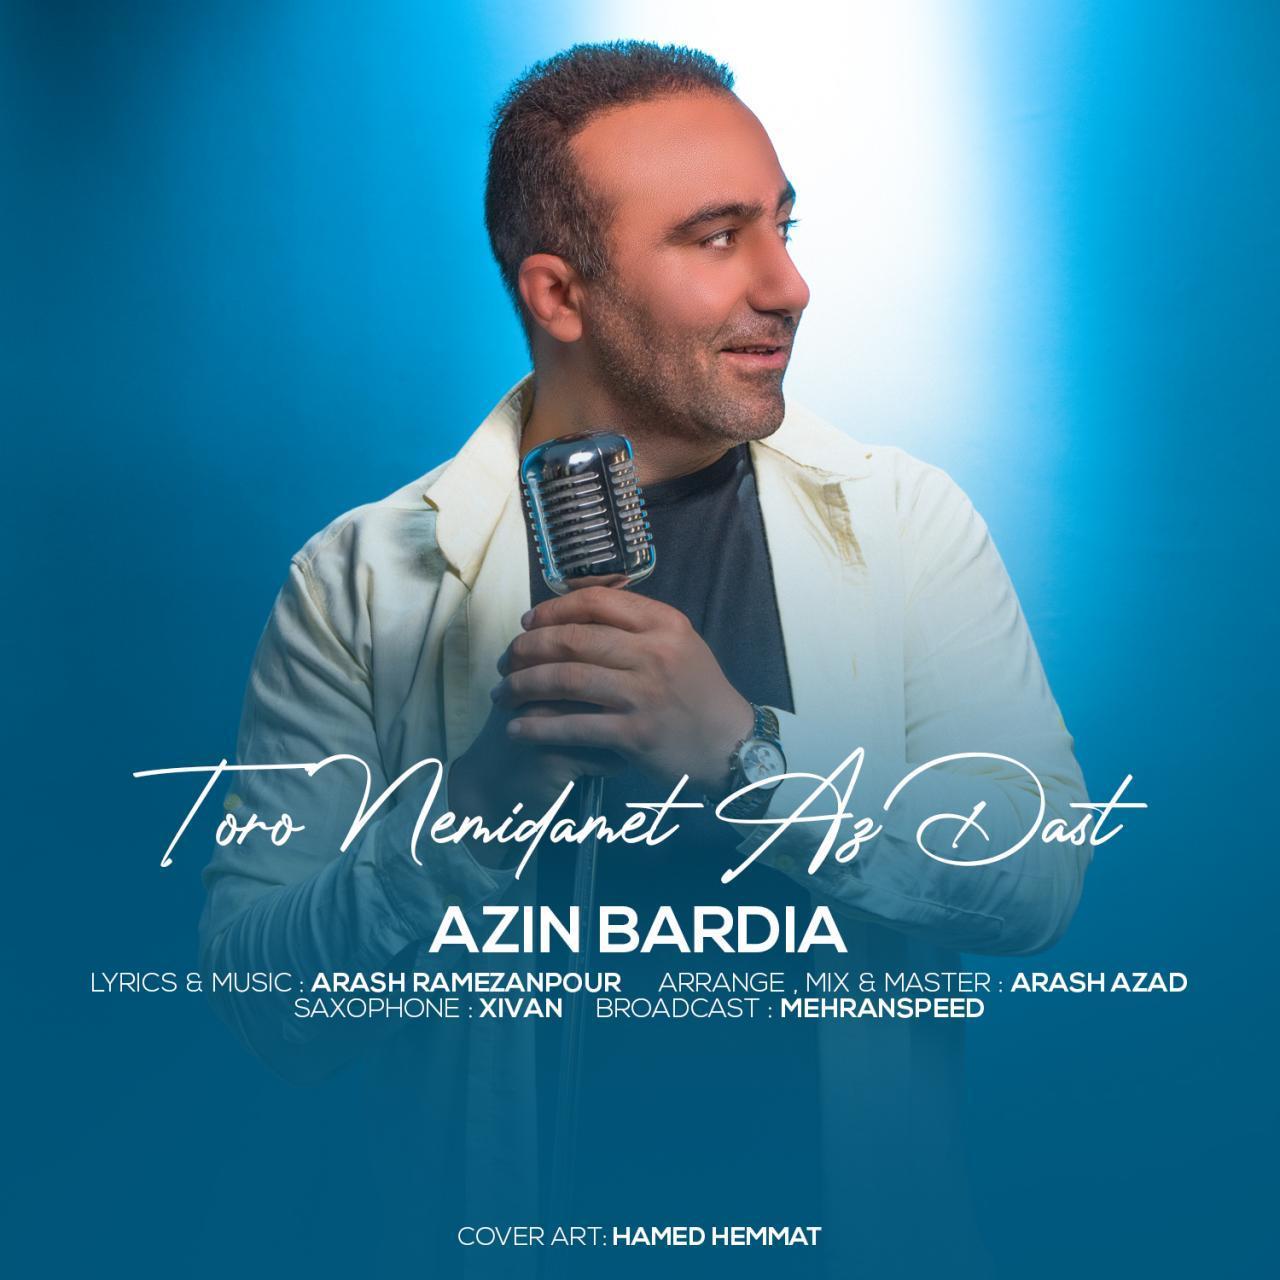 Azin Bardia – Toro Nemidamet Az Dast